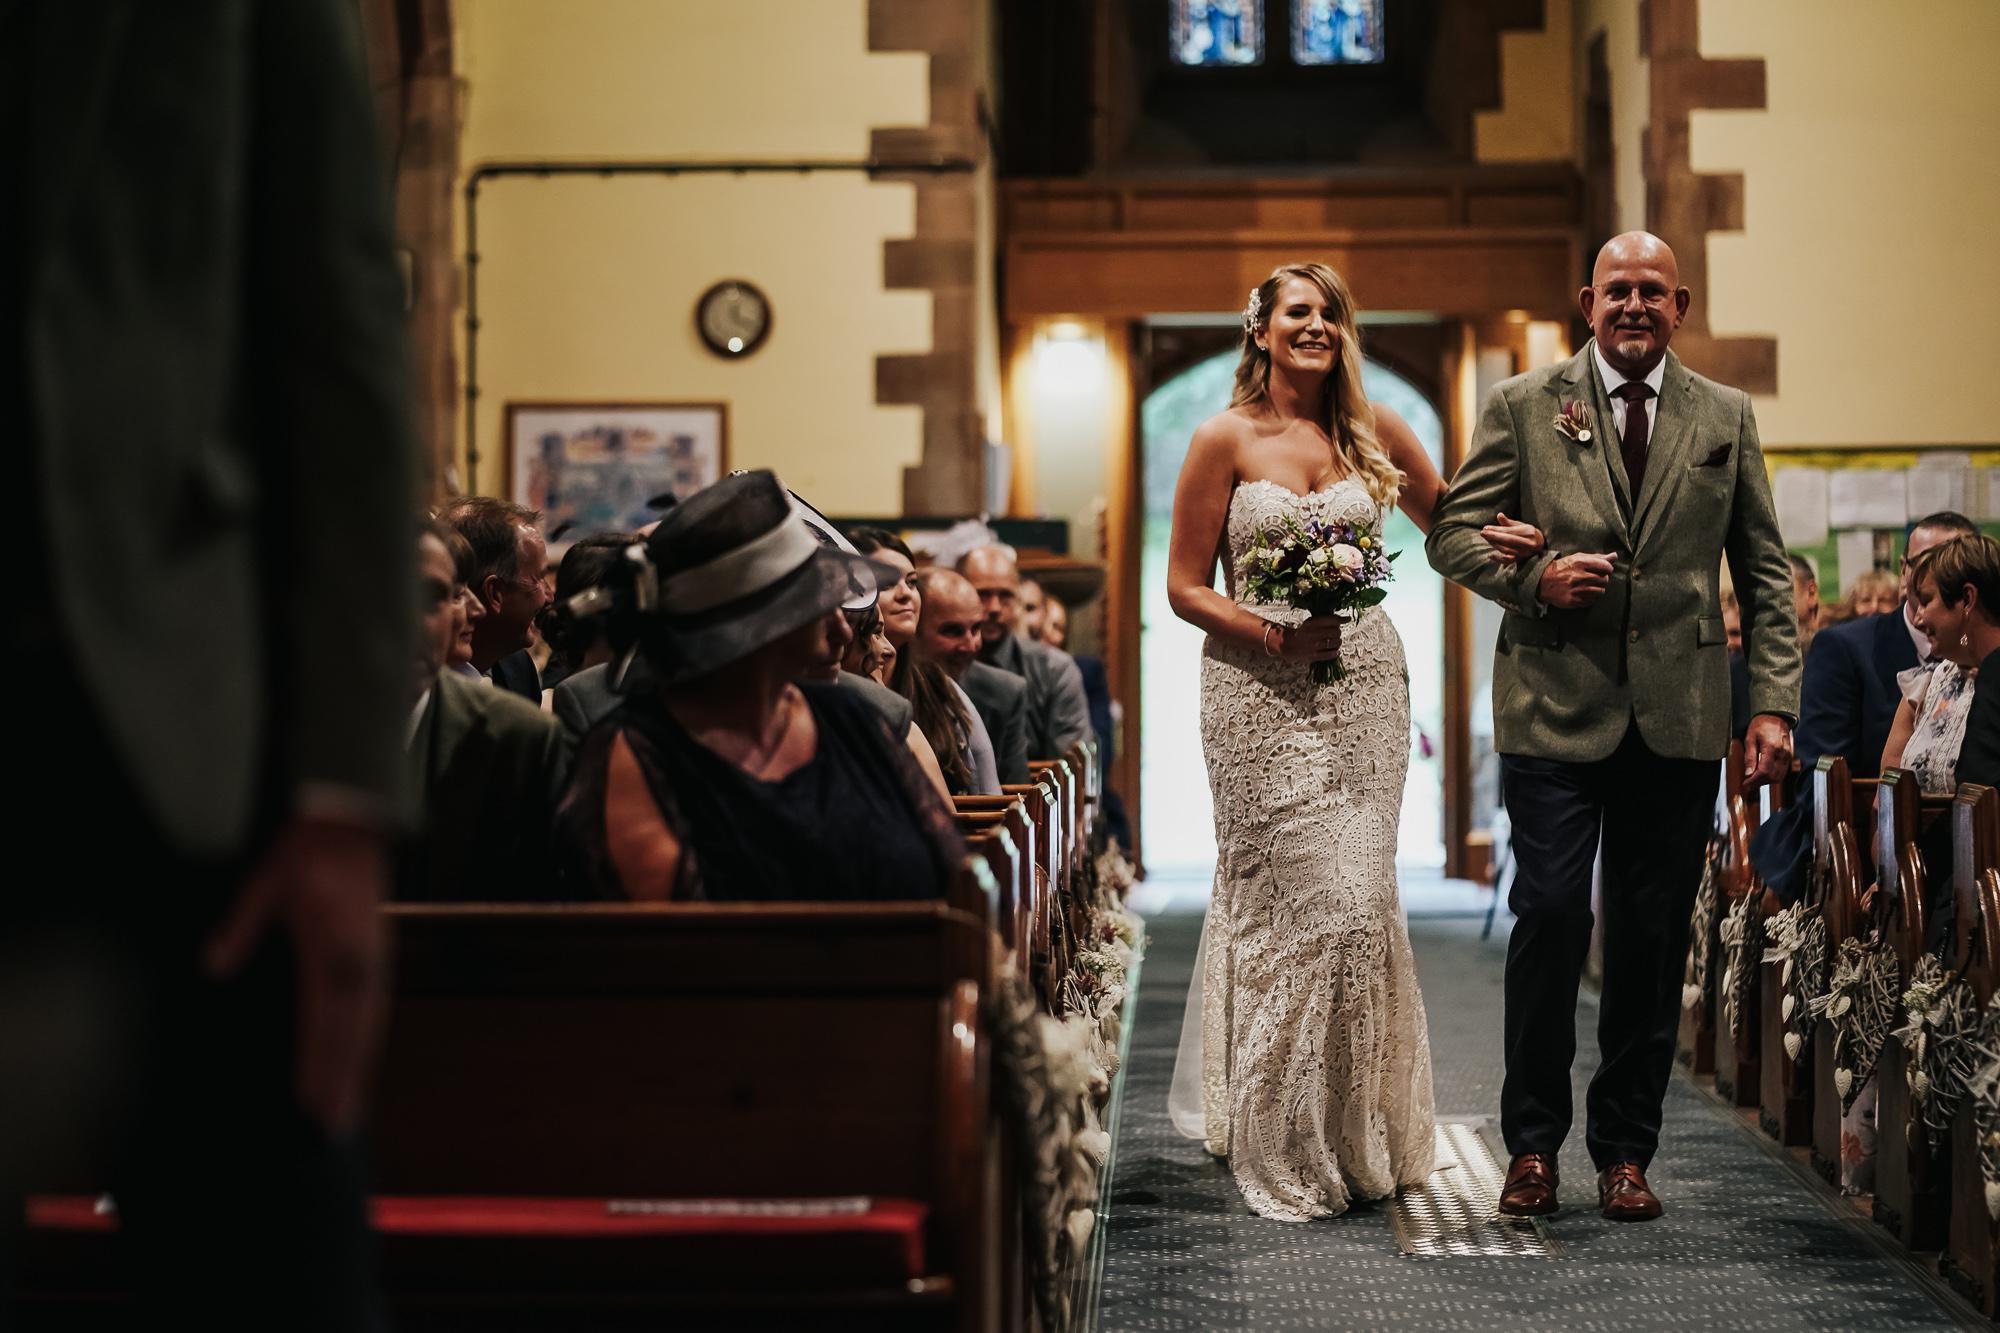 High Barn Wedding photographer lake distect penrith documentry wedding photography (25 of 57).jpg